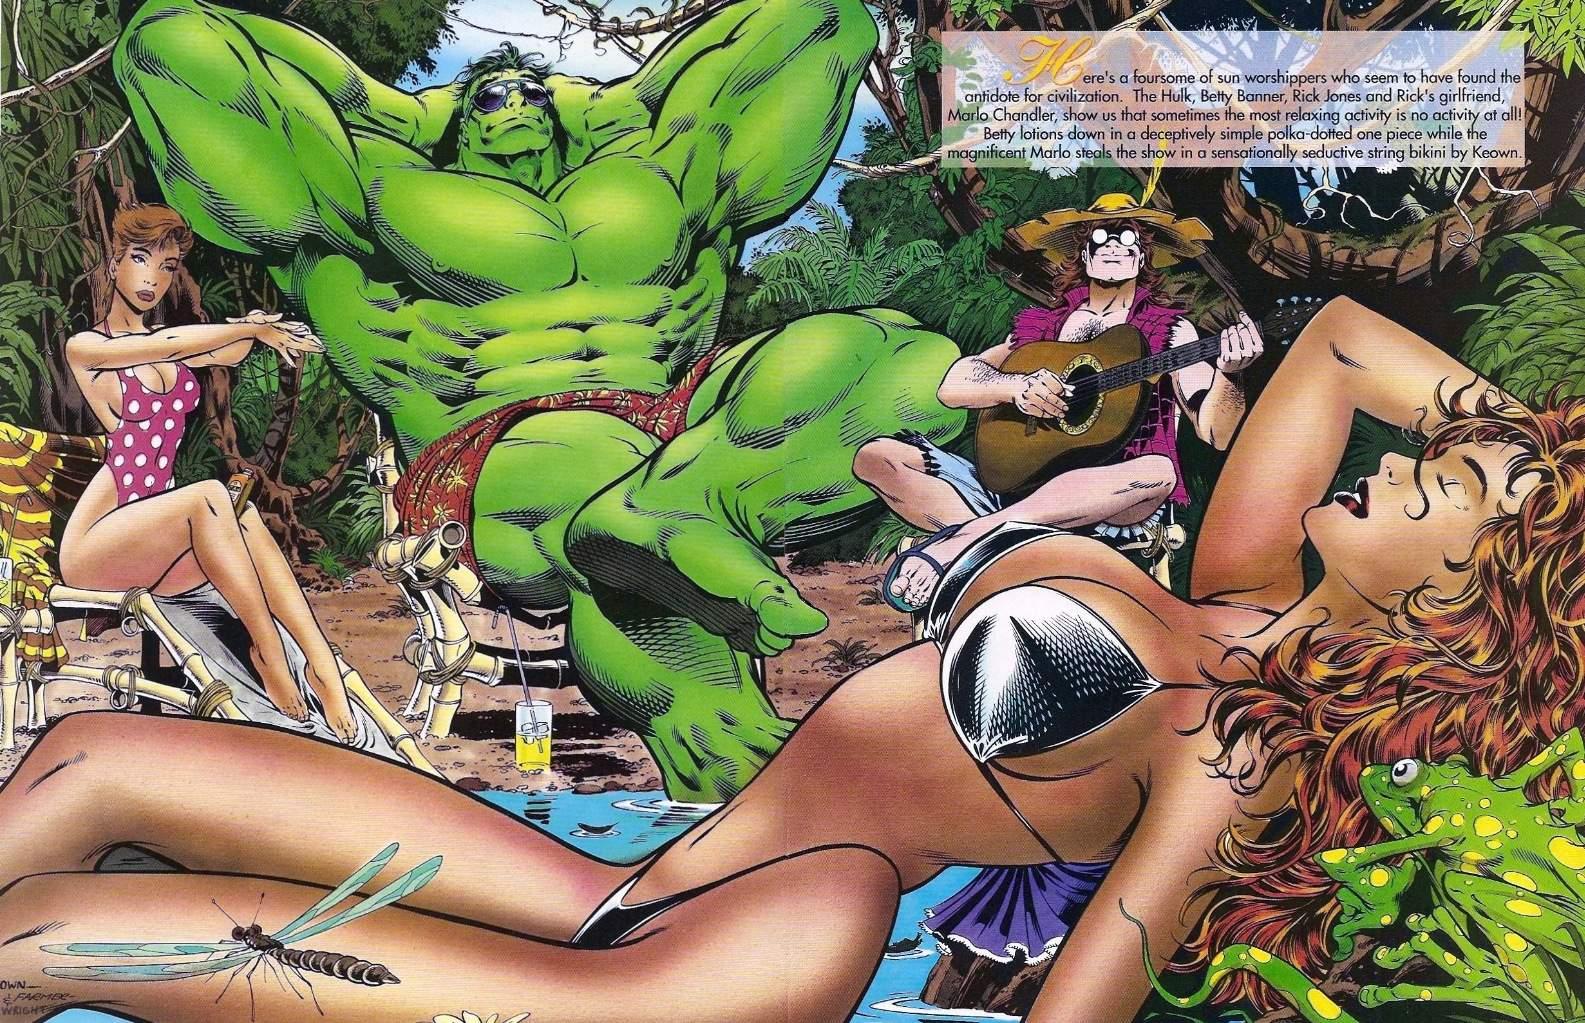 http://4.bp.blogspot.com/-eRu_hKCR7RI/TiUGwNuPVtI/AAAAAAAAL2g/mABS9LMvltM/s1600/2_Marlo_Hulk_Marvel_Swimsuit_Special_1992.jpg